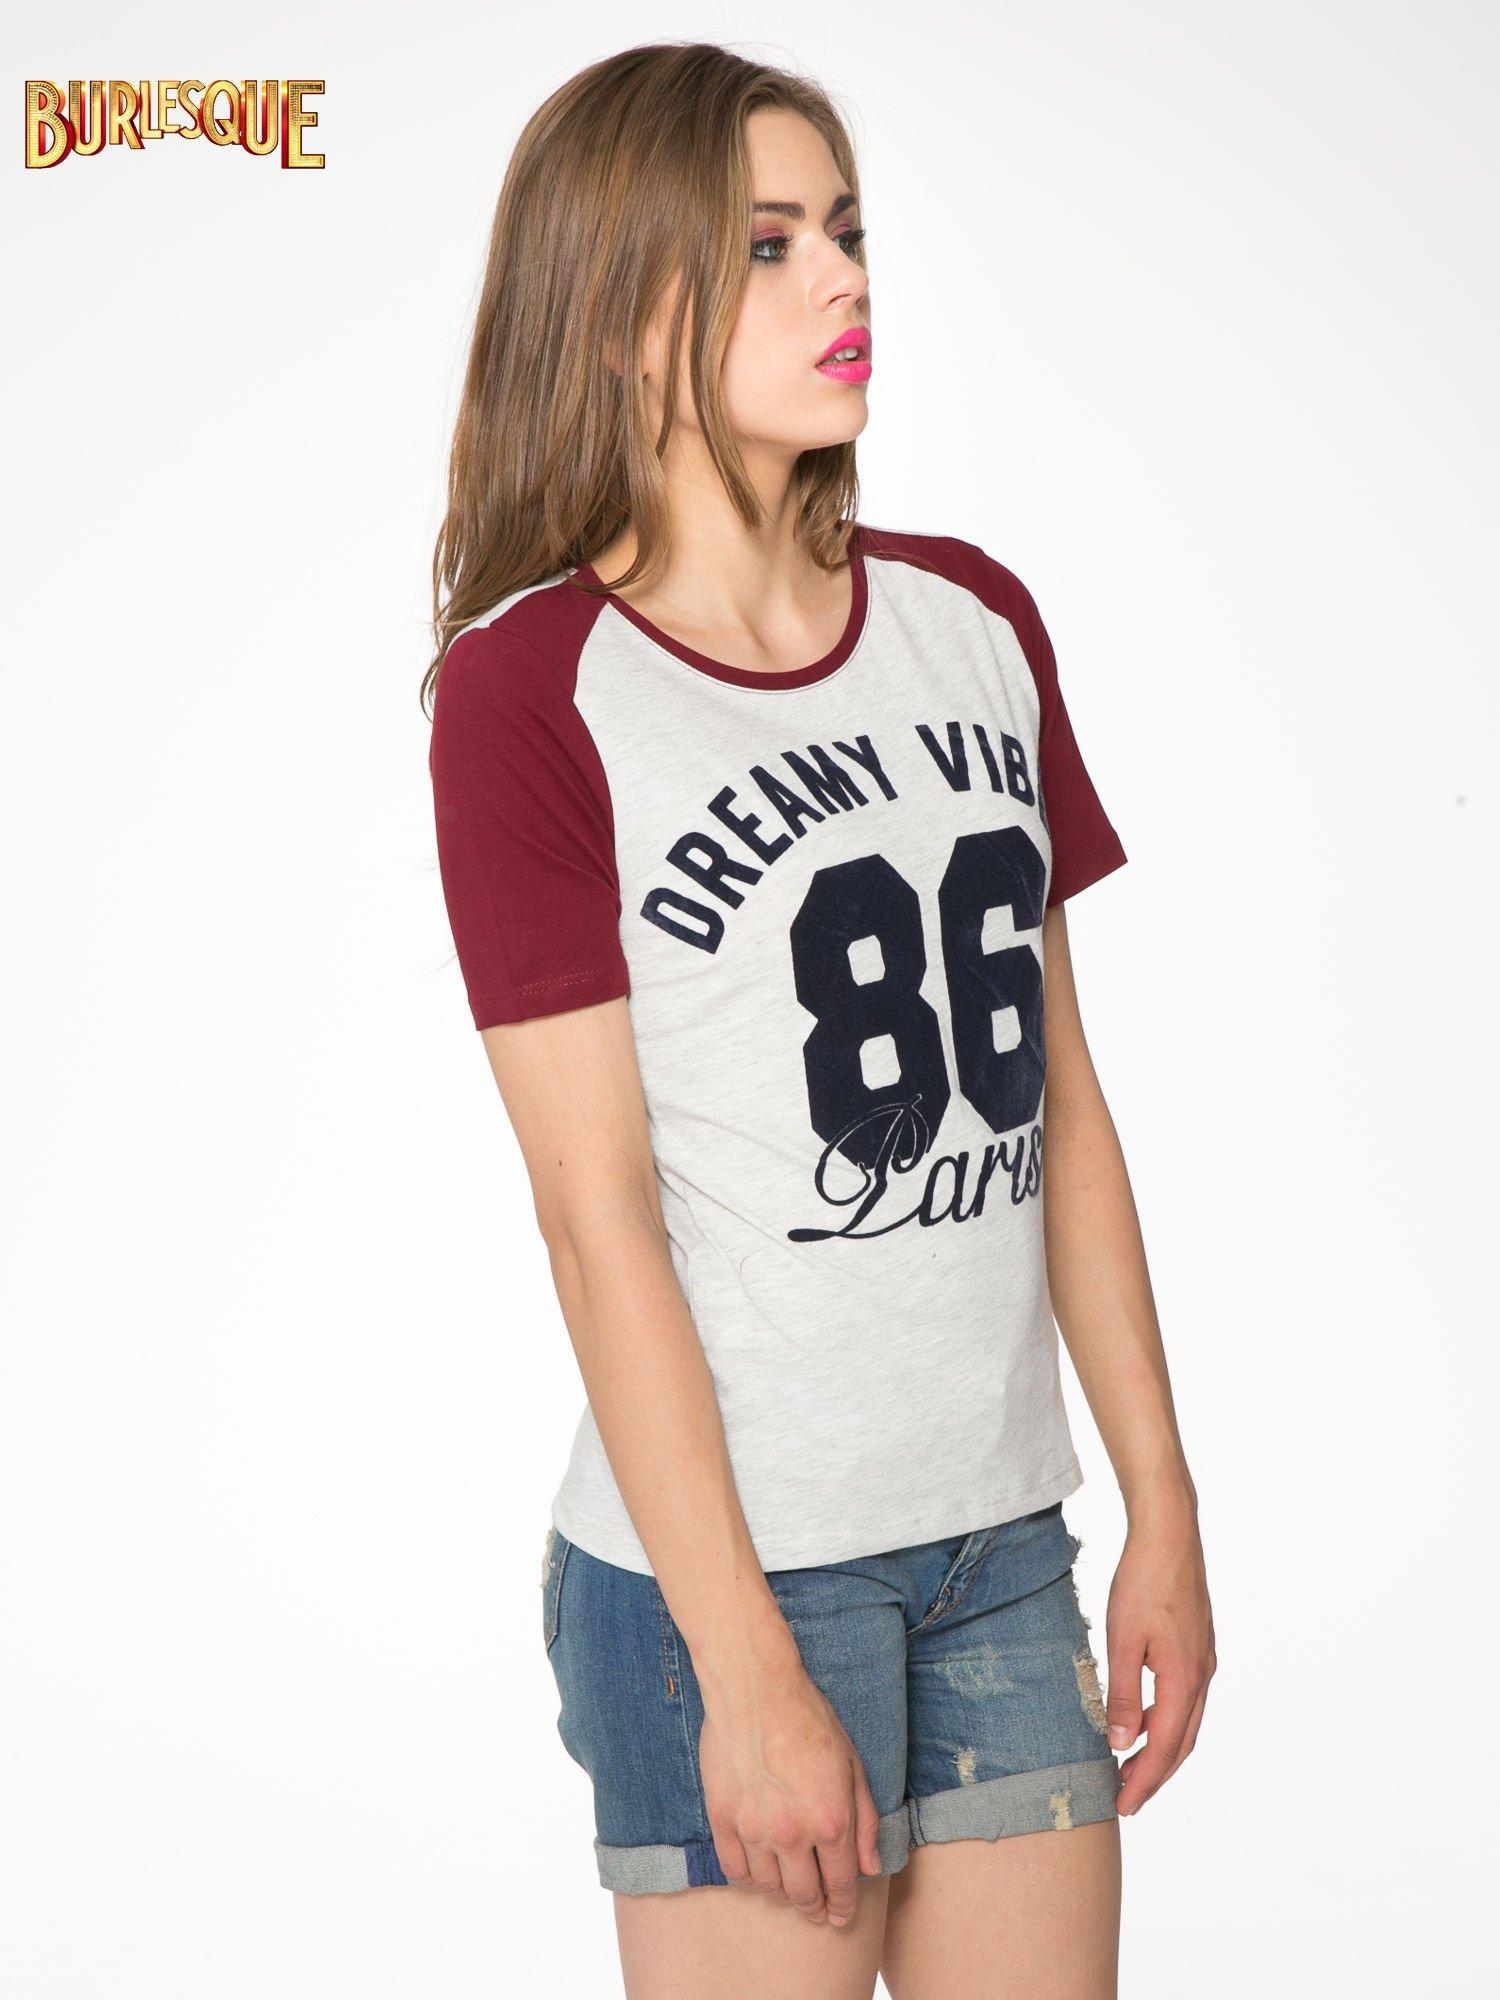 Szaro-bordowy t-shirt z napisem DREAMY VIBES 86 PARIS                                  zdj.                                  3